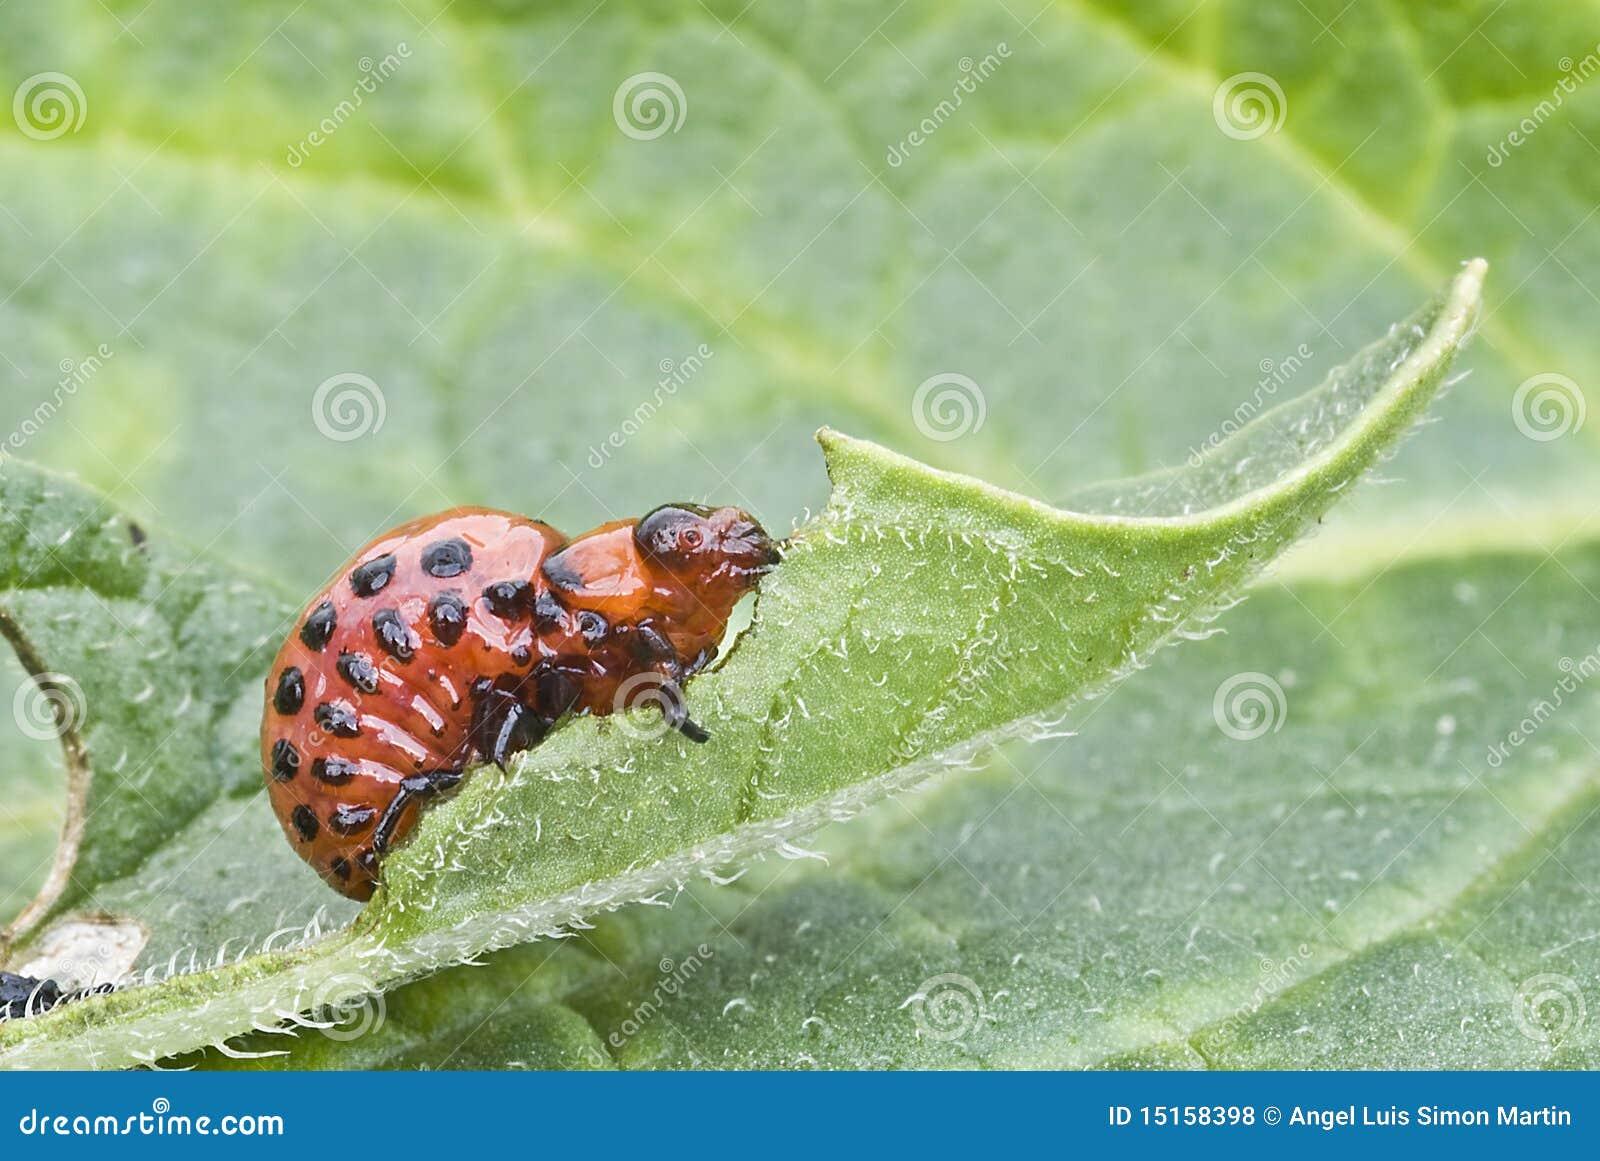 Larva Of Colorado Potato Beetle. Royalty Free Stock Photos ...